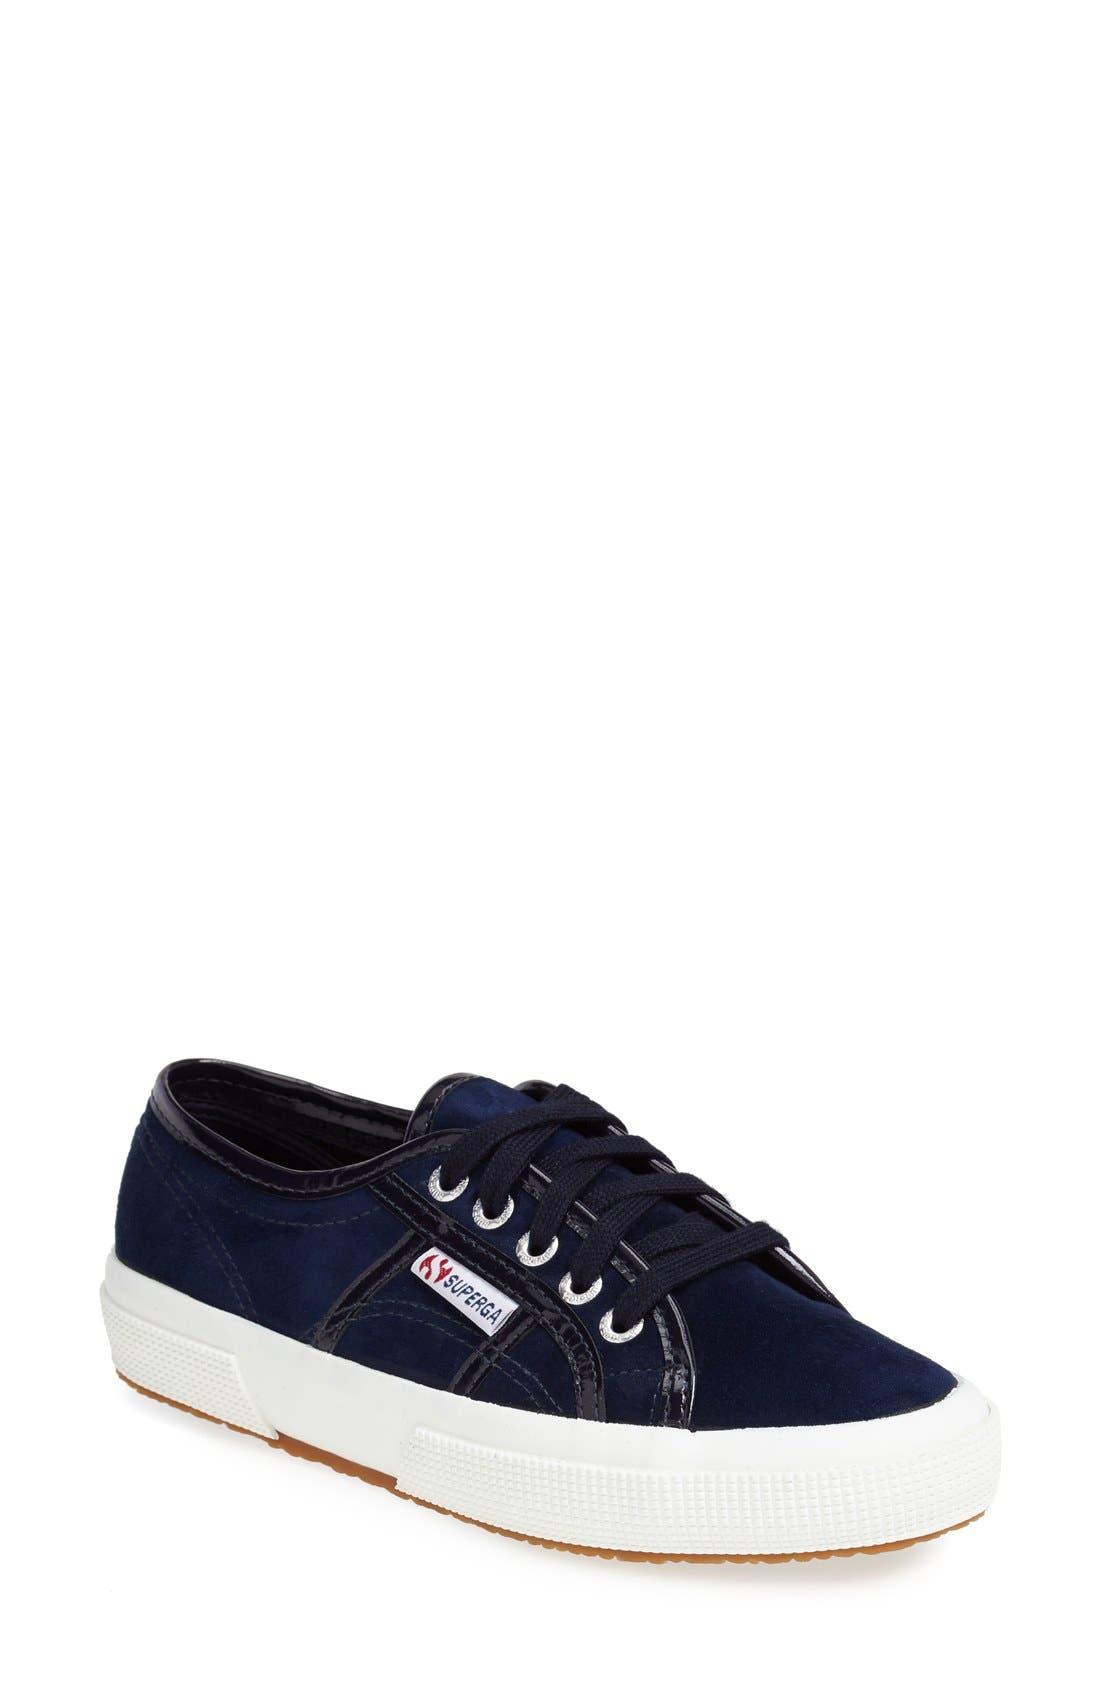 Main Image - Superga Suede Slip-On Sneaker (Women)